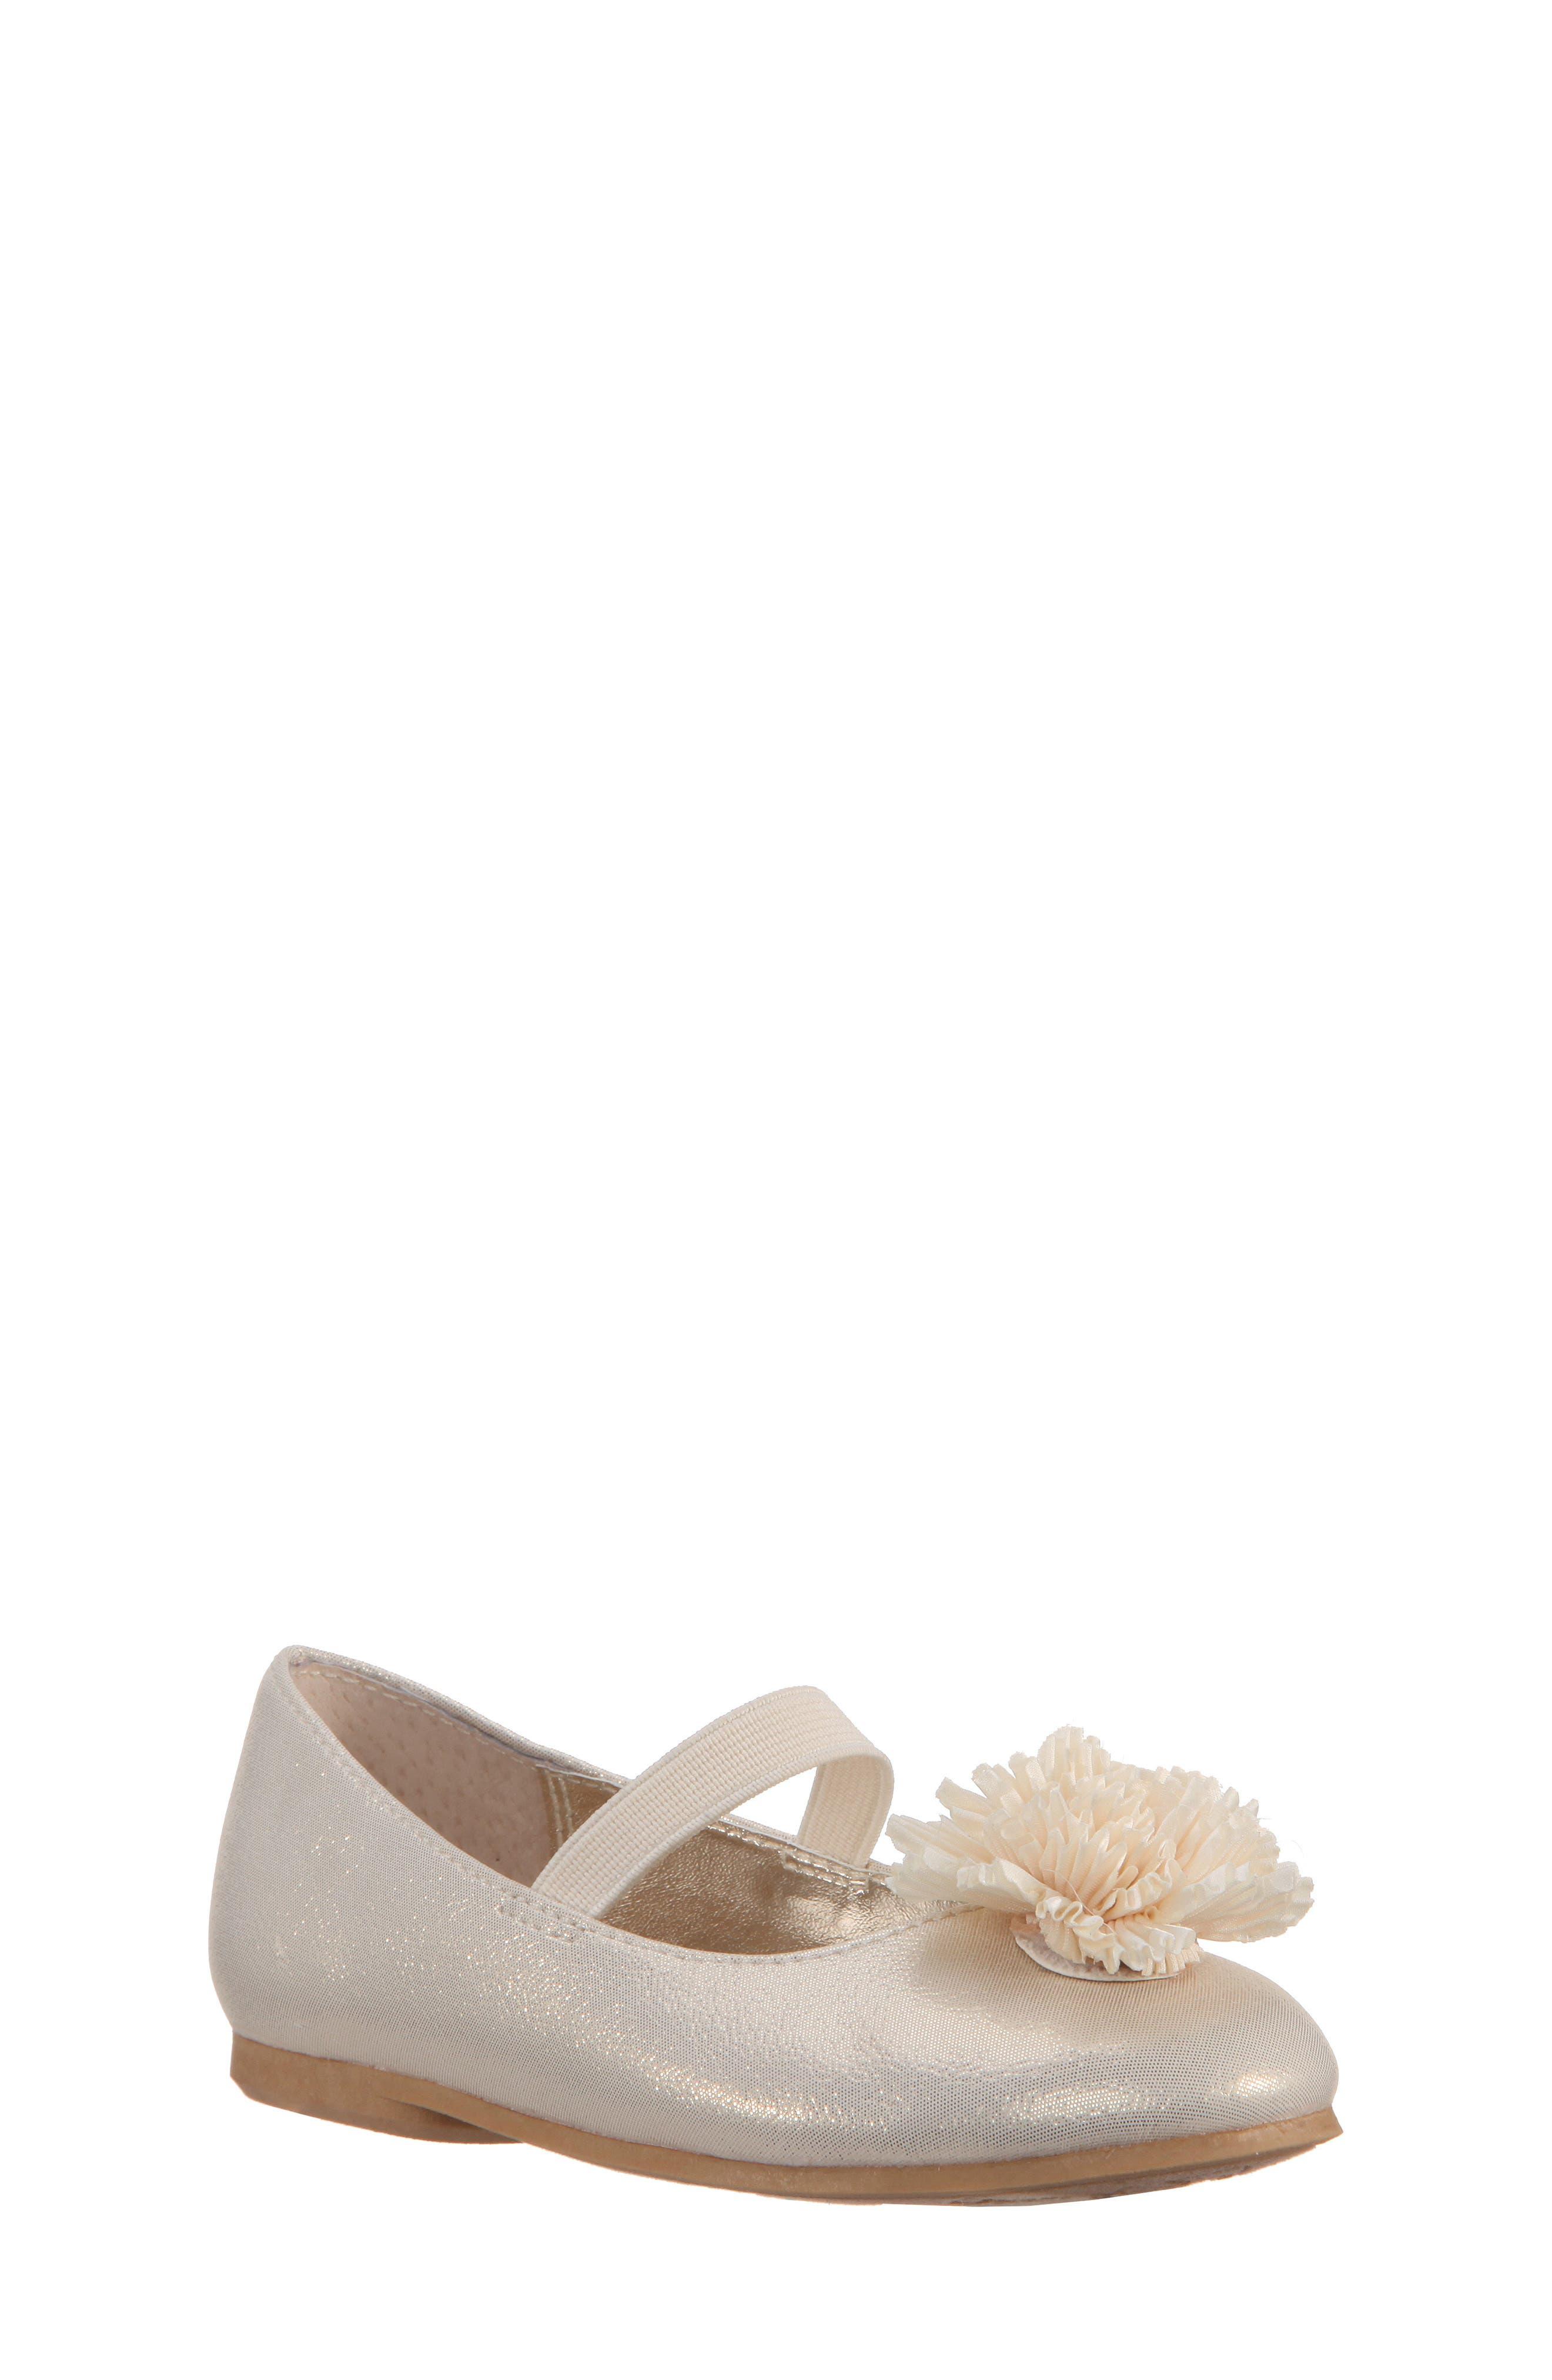 Jemma-T Bow Ballet Flat,                             Main thumbnail 1, color,                             040